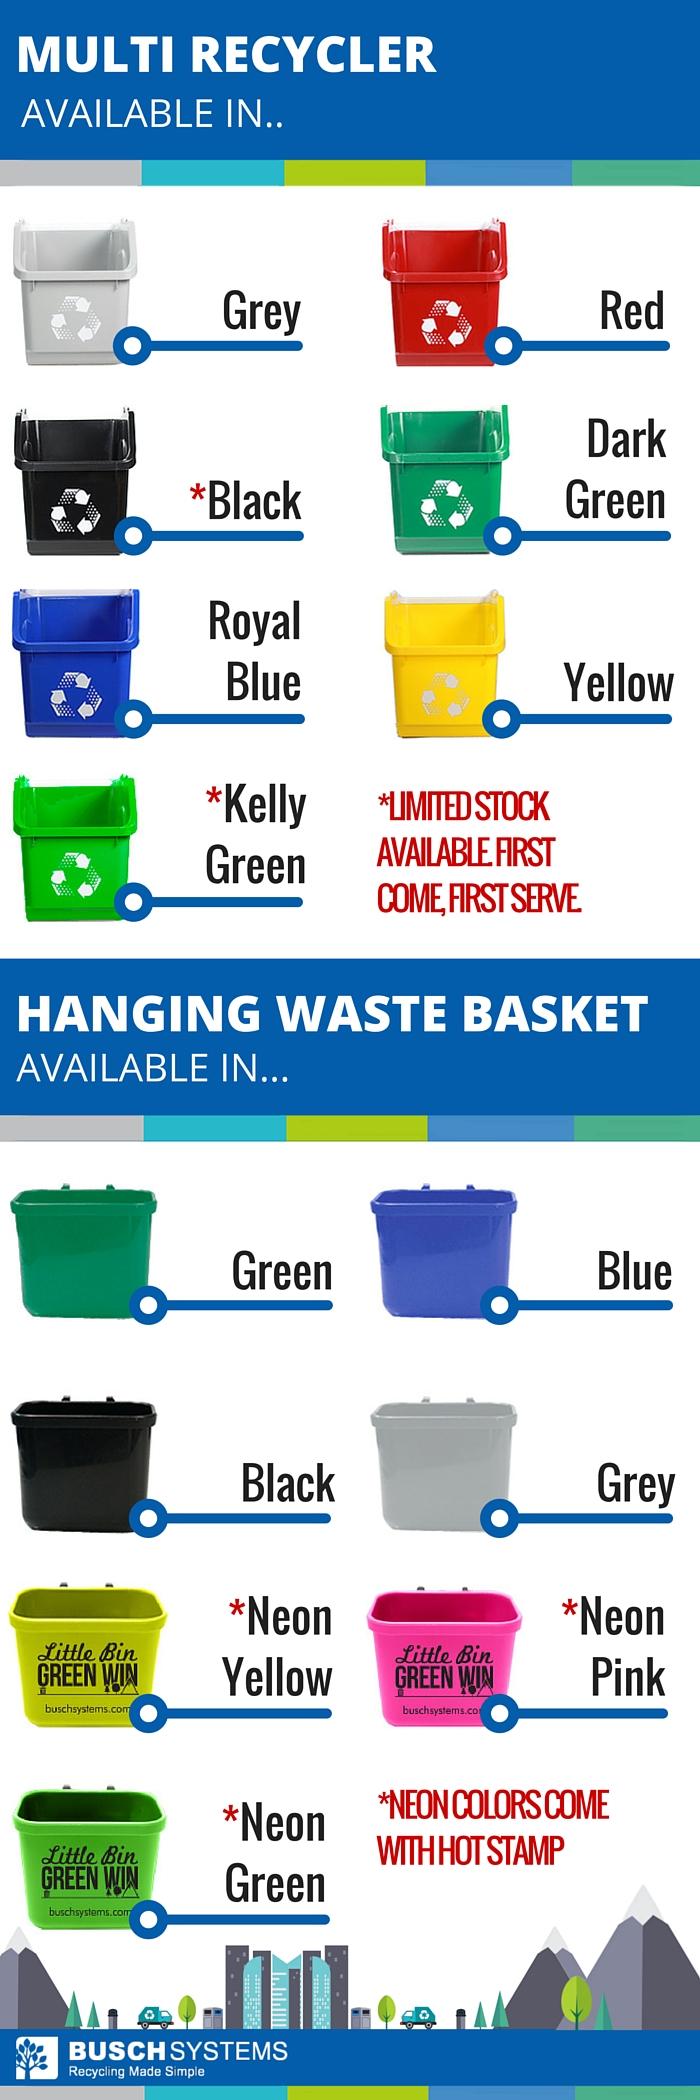 Multi Recycler (8)